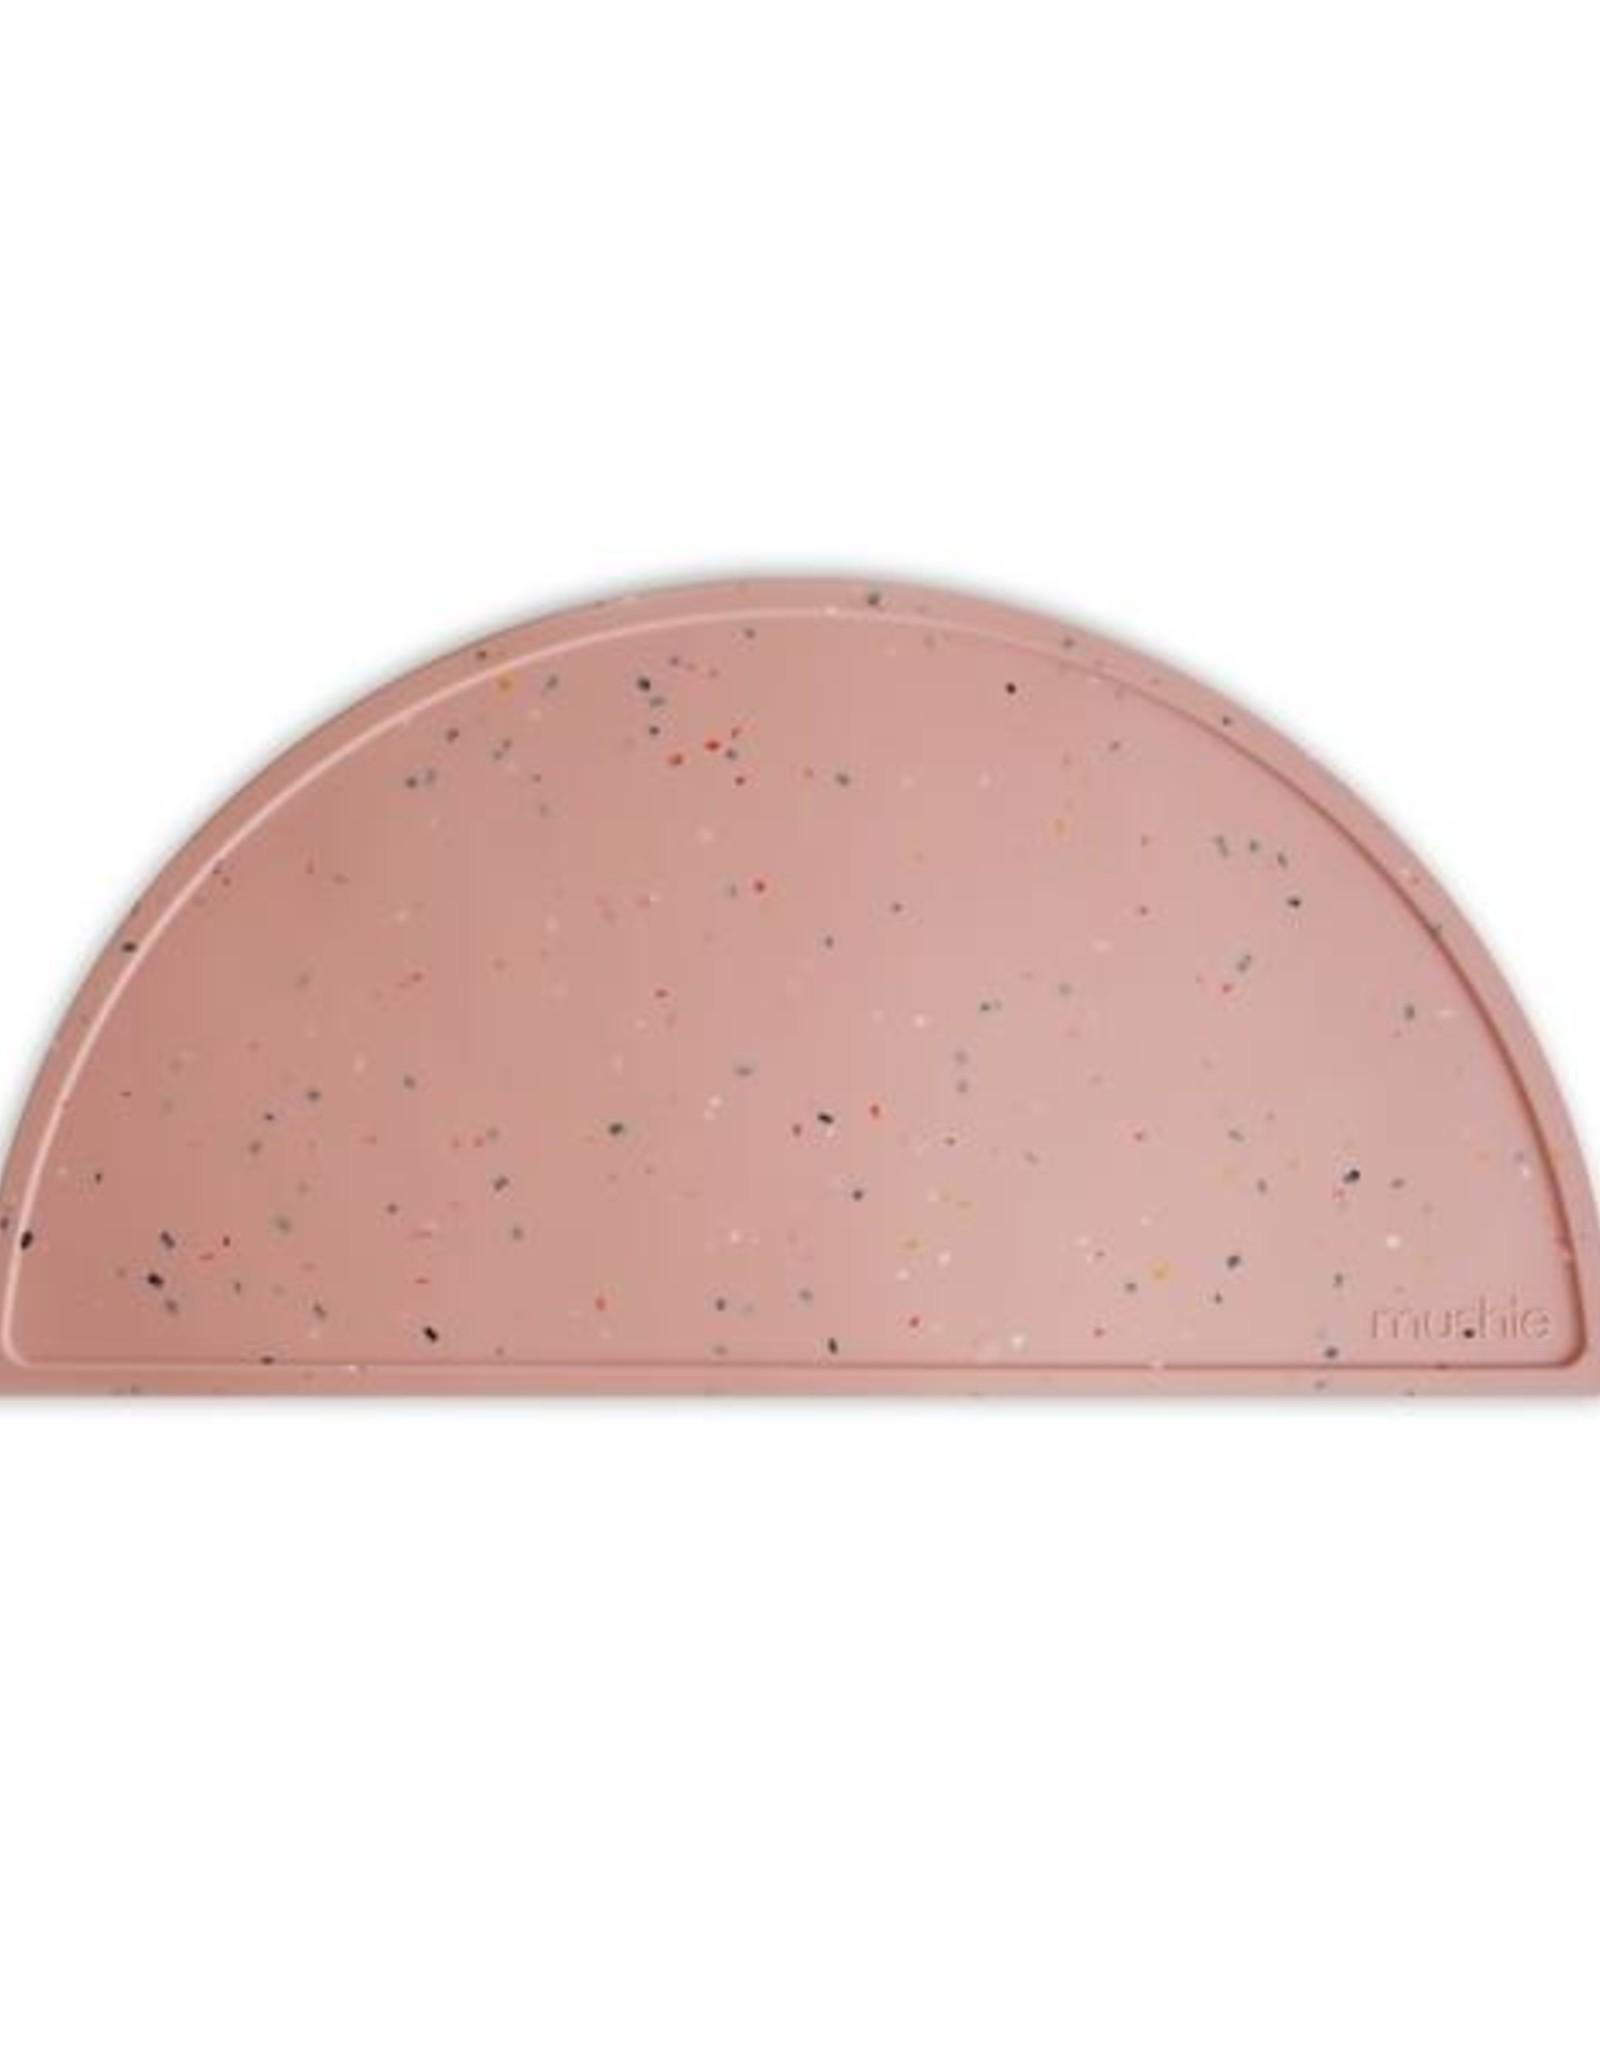 Mushie Mushie placemat Confetti pink powder